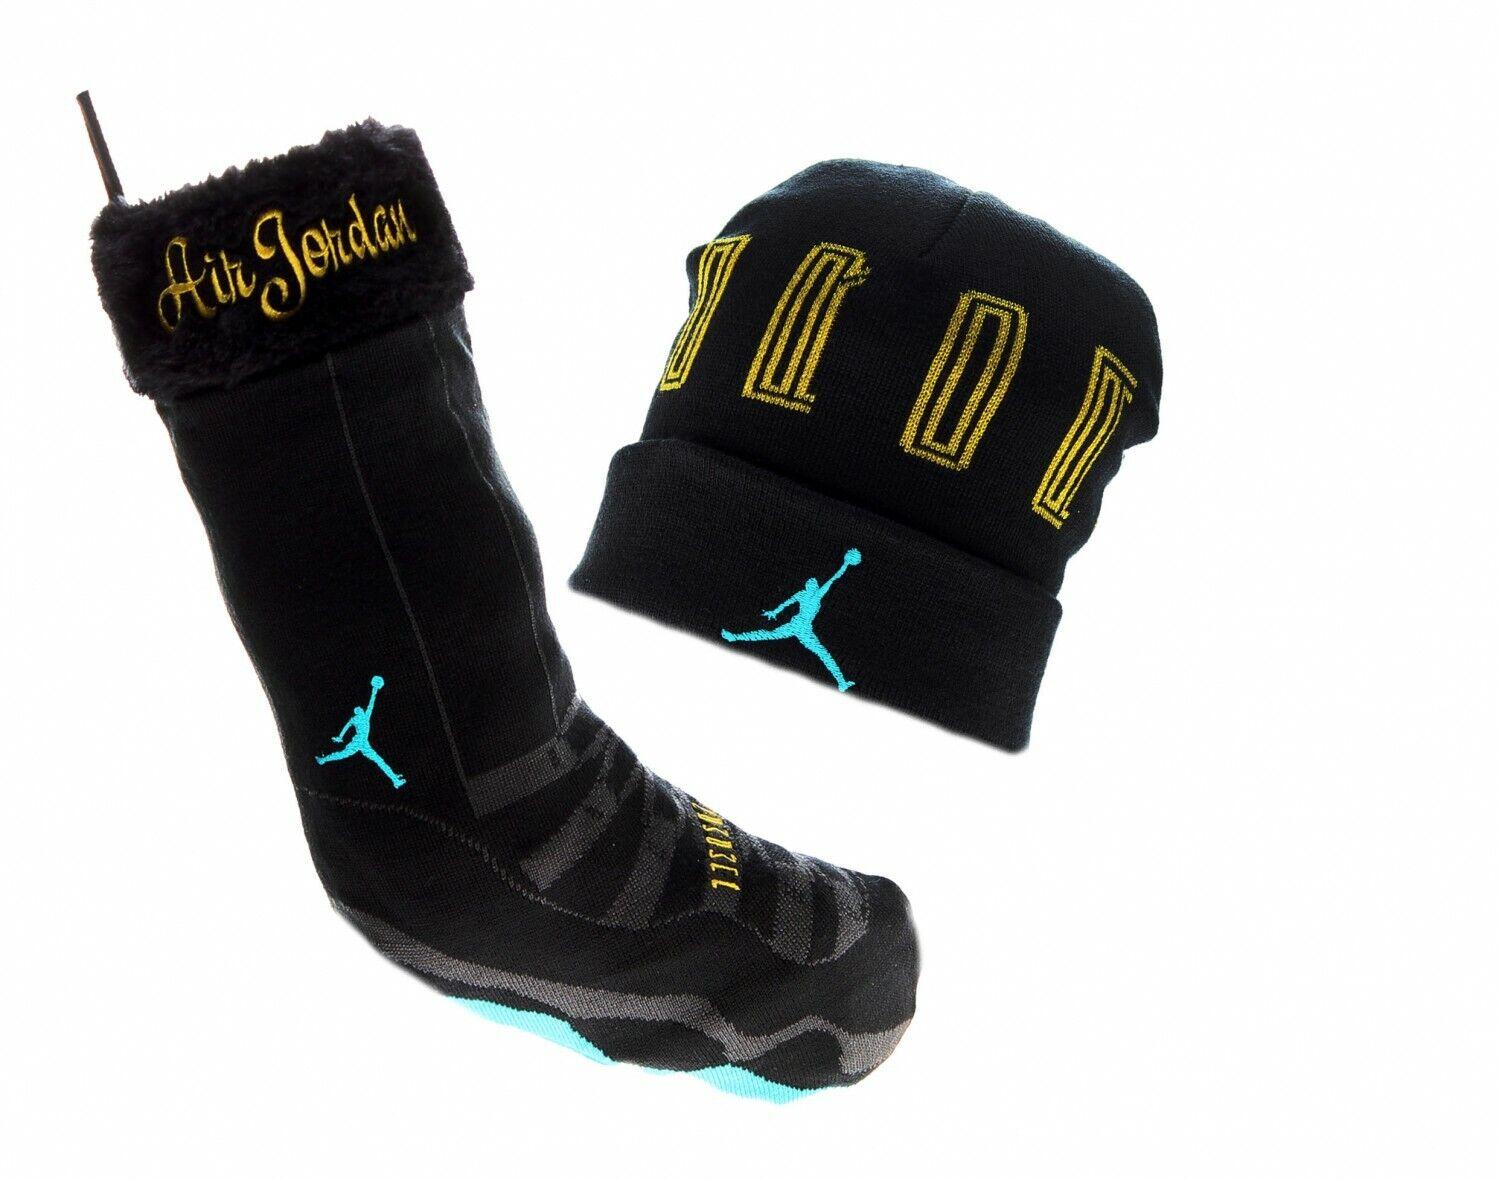 Air Jordan Retro 11 Holiday Gift Set 507949 016 Black/Blue-Gold New Adult Unisex